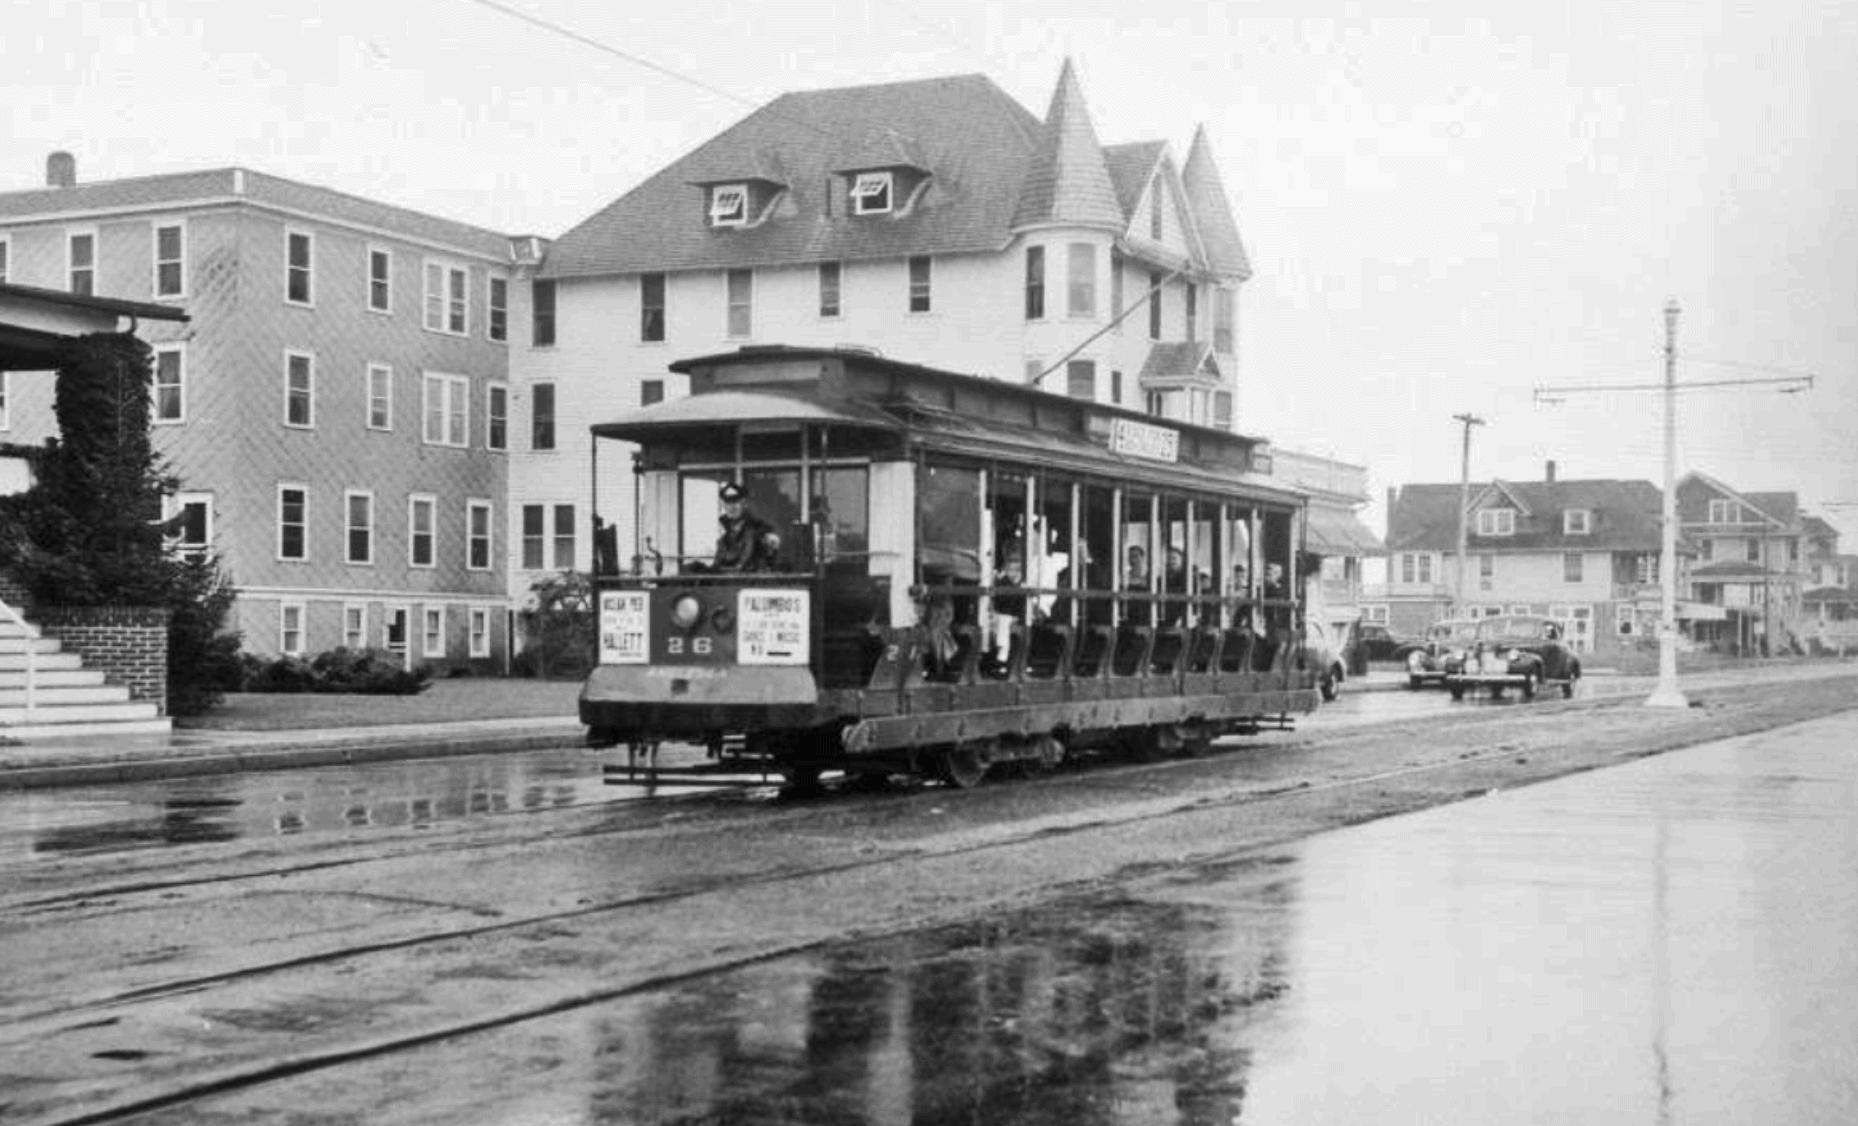 Wildwood Trolley To Be Restored